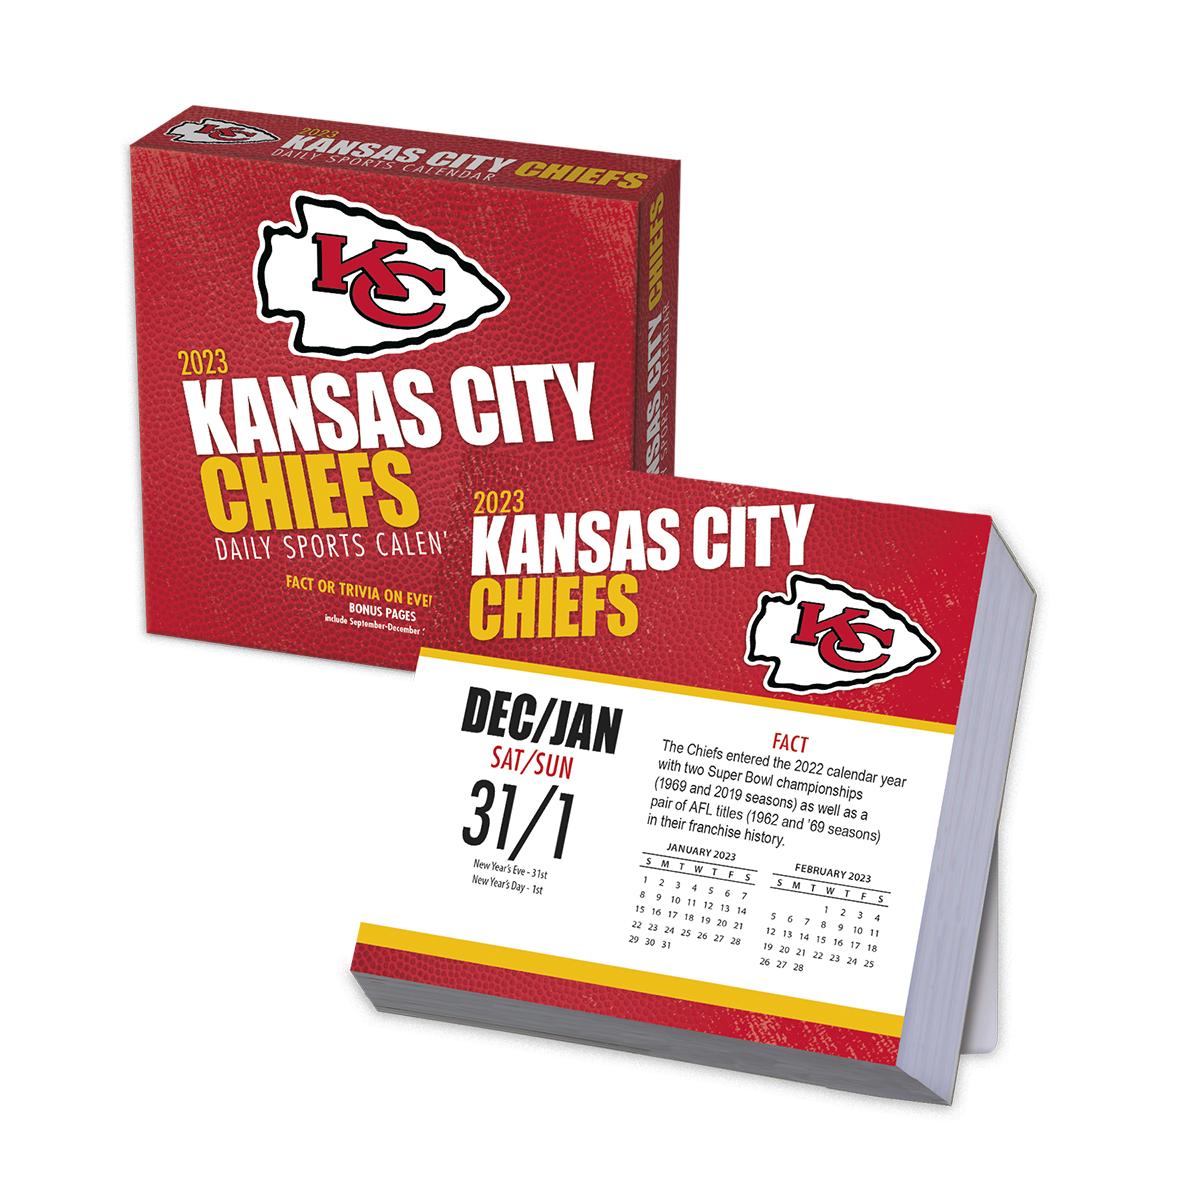 Kansas City Chiefs 2019 NFL Page-A-Day Box Calendar - Buy ...